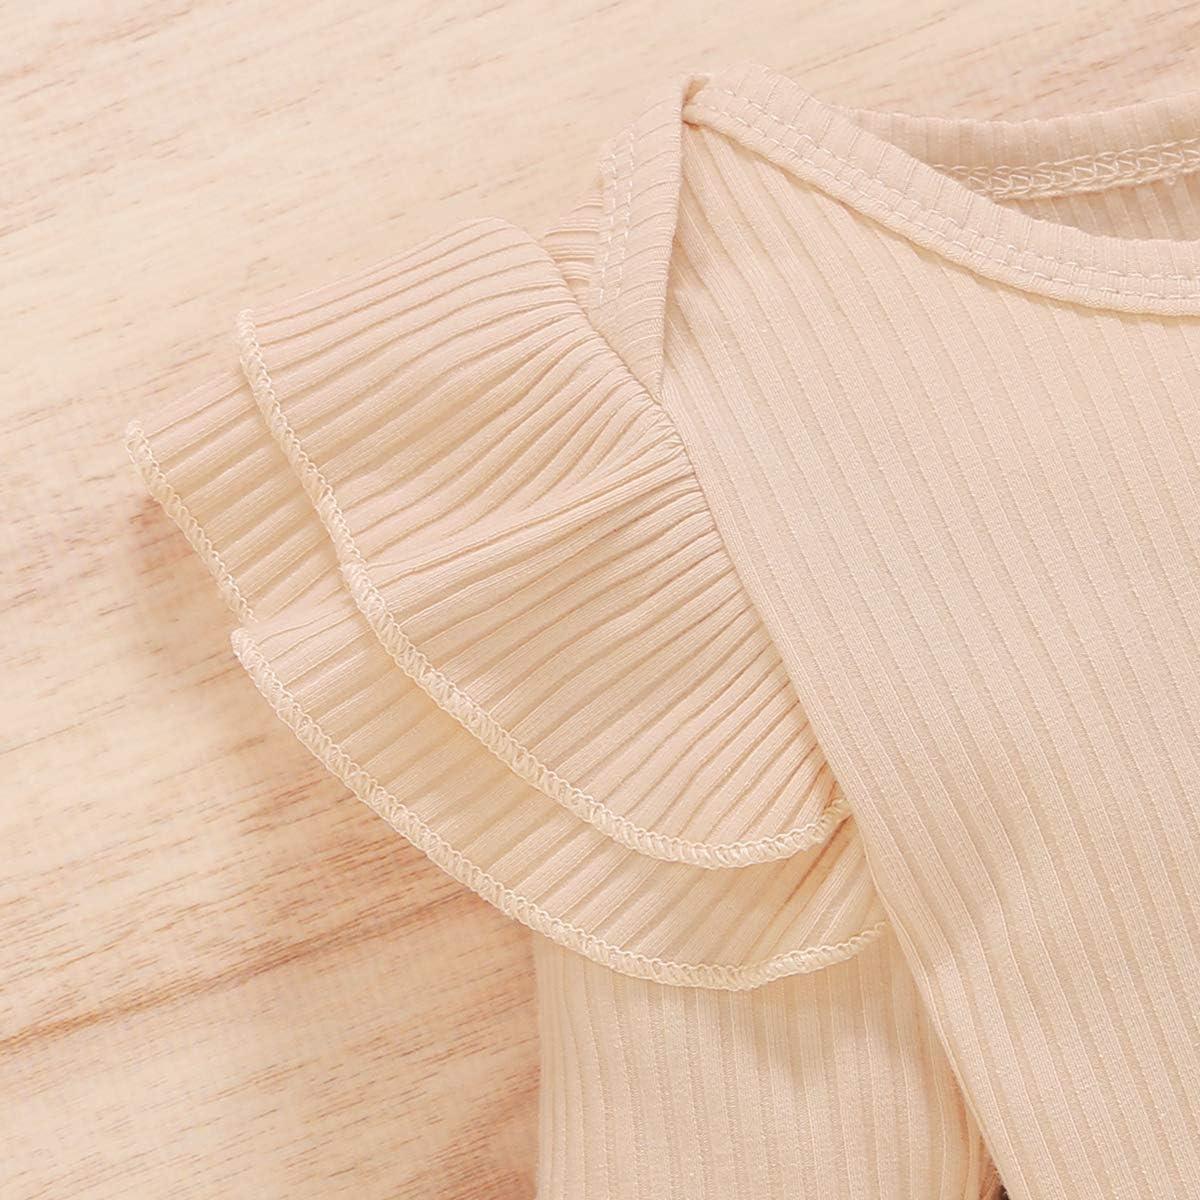 CARETOO 3Pcs Baby Girls Bodysuit Tops Outfits Set, Soft Cotton Infant Girl Long Sleeve Clothes Sets